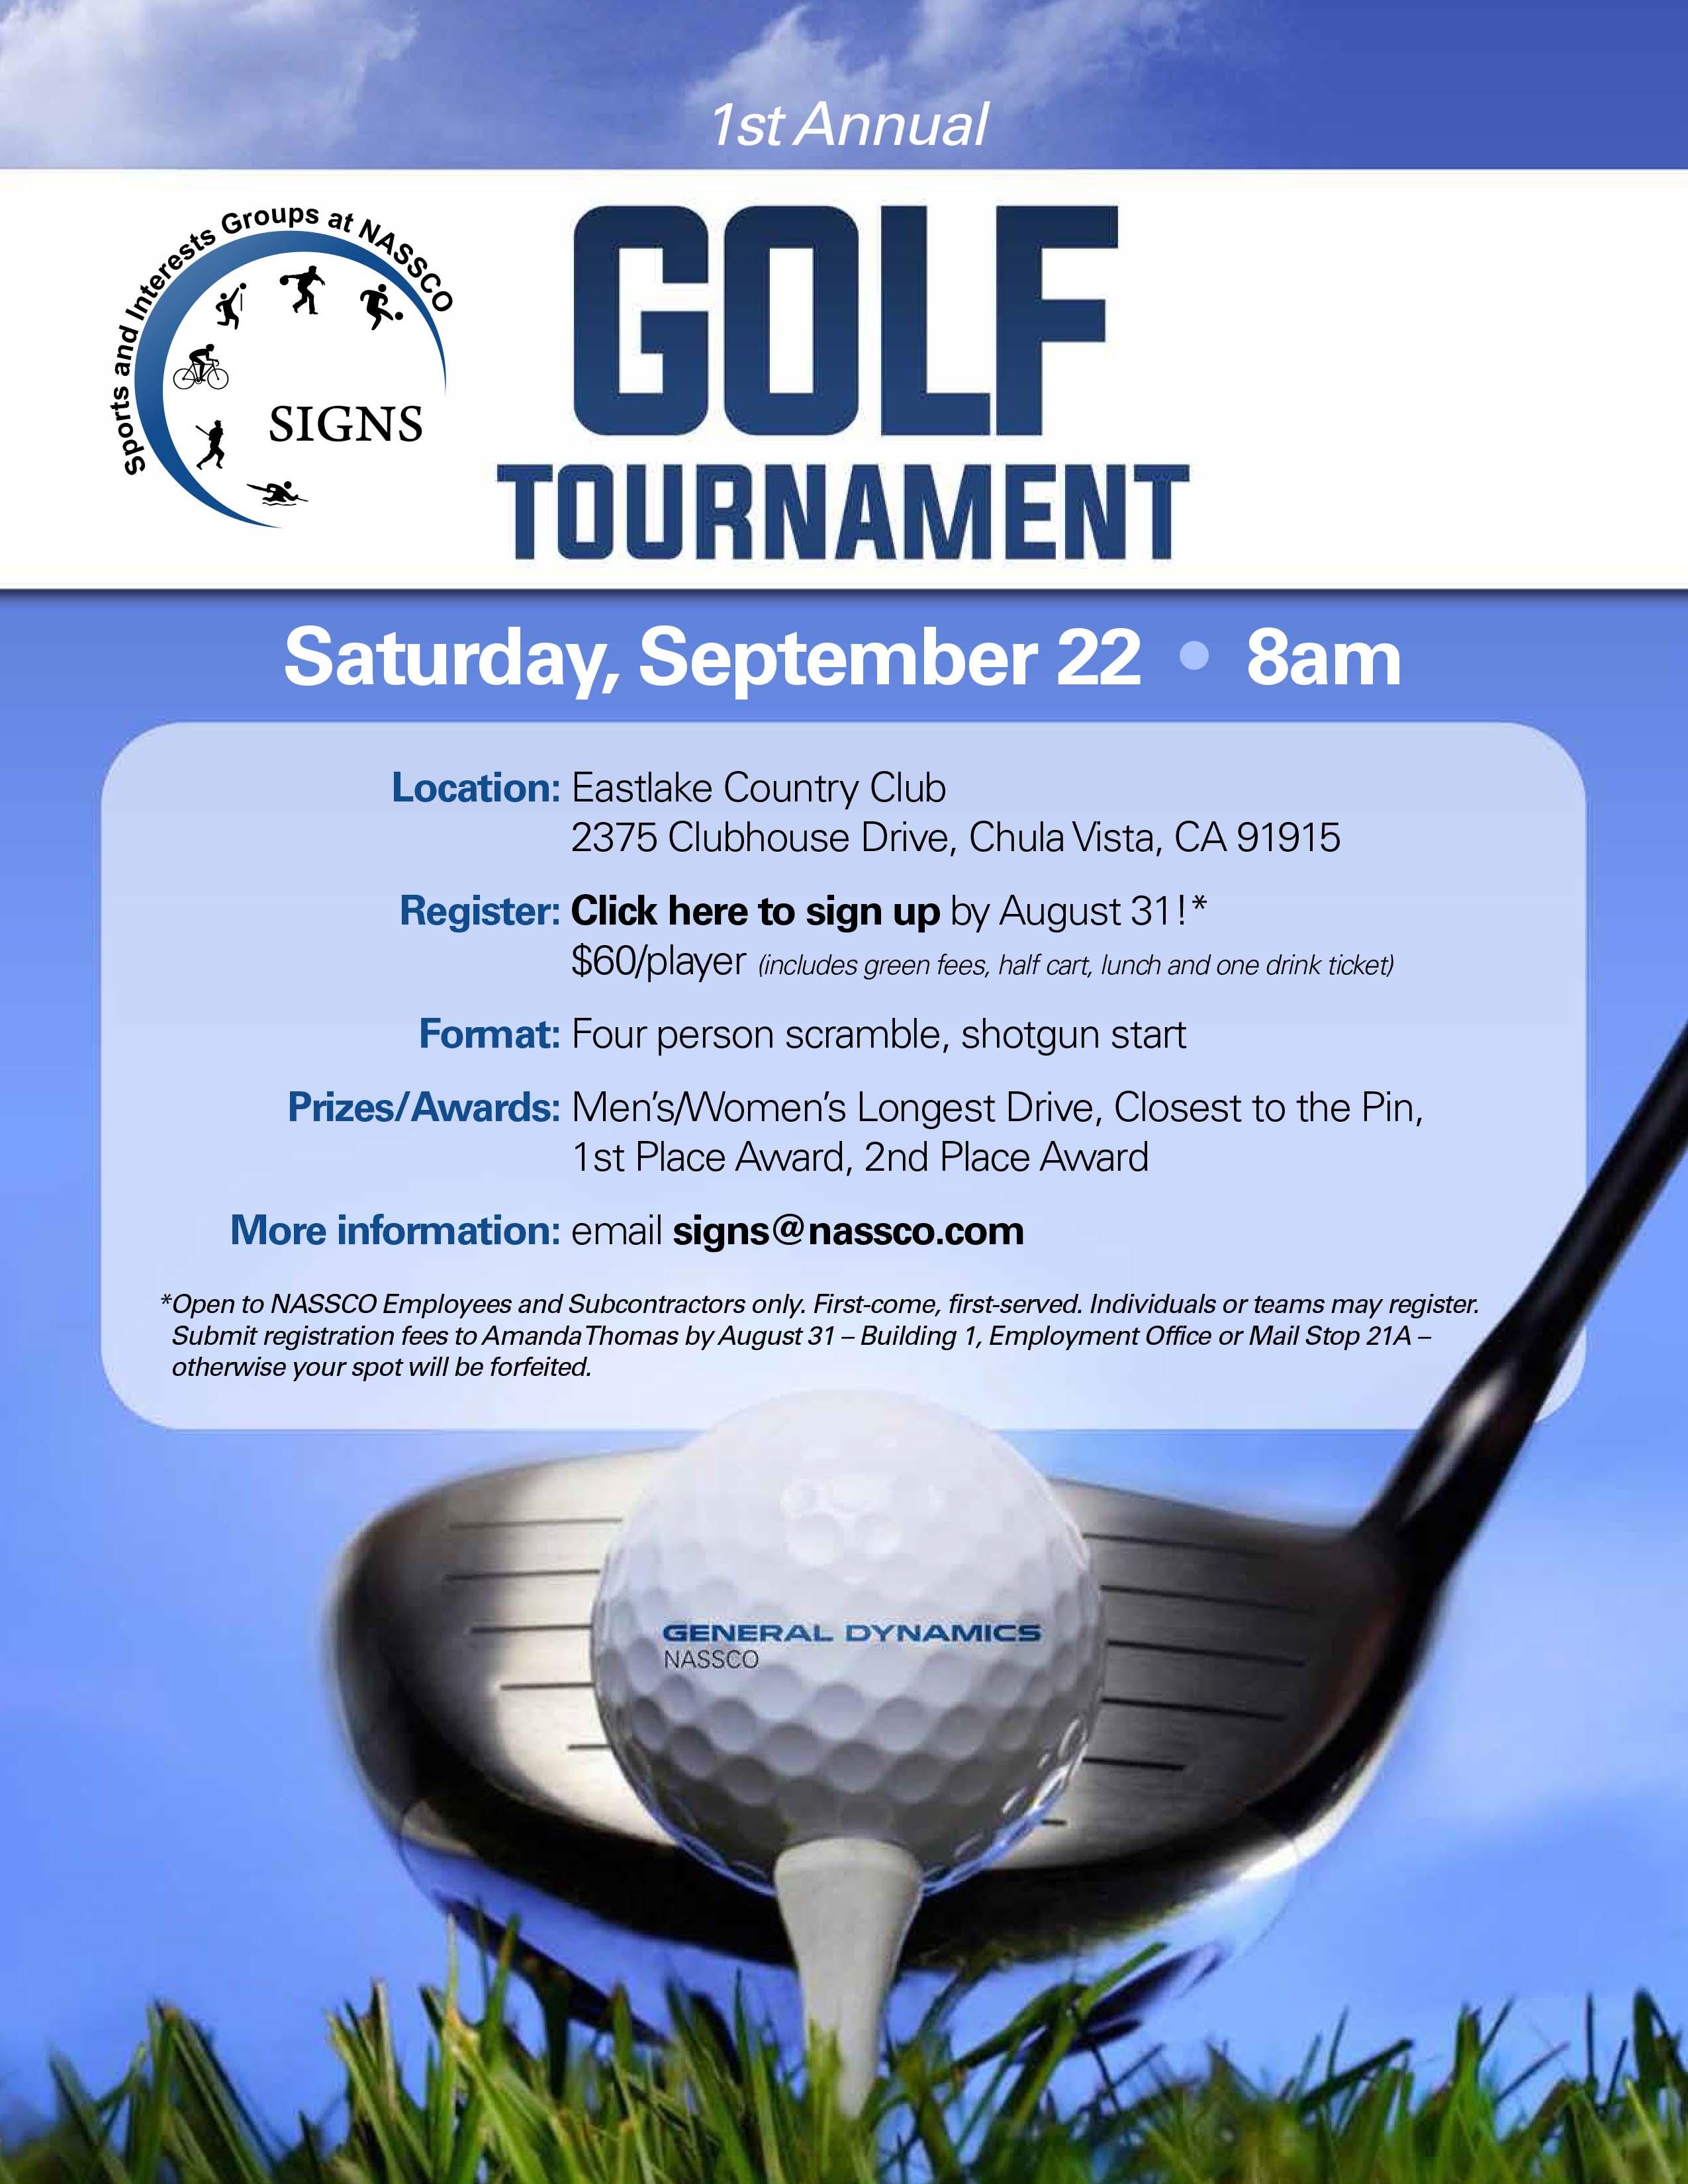 Golf tournament prizes longest drive